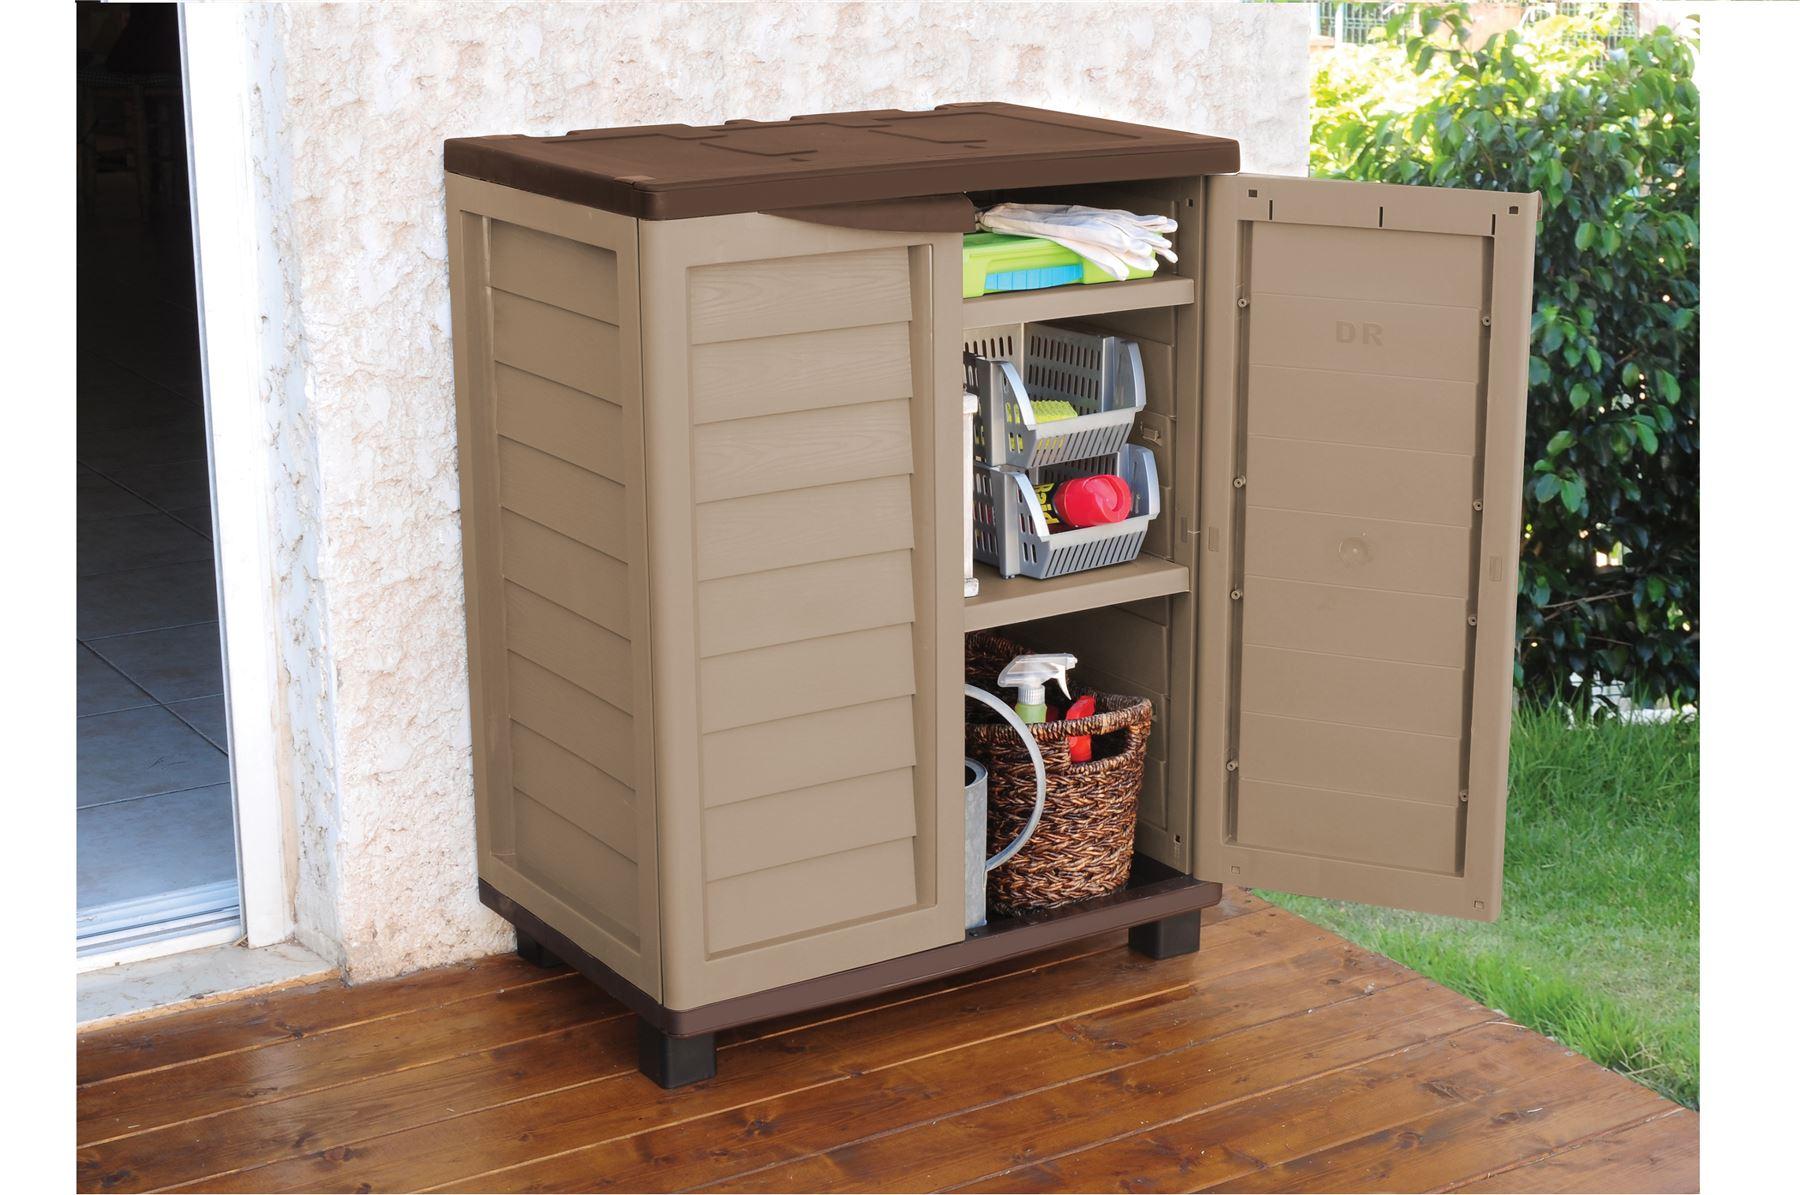 Covered Outdoor Storage : Garden indoor outdoor garage storage low utility cabinet